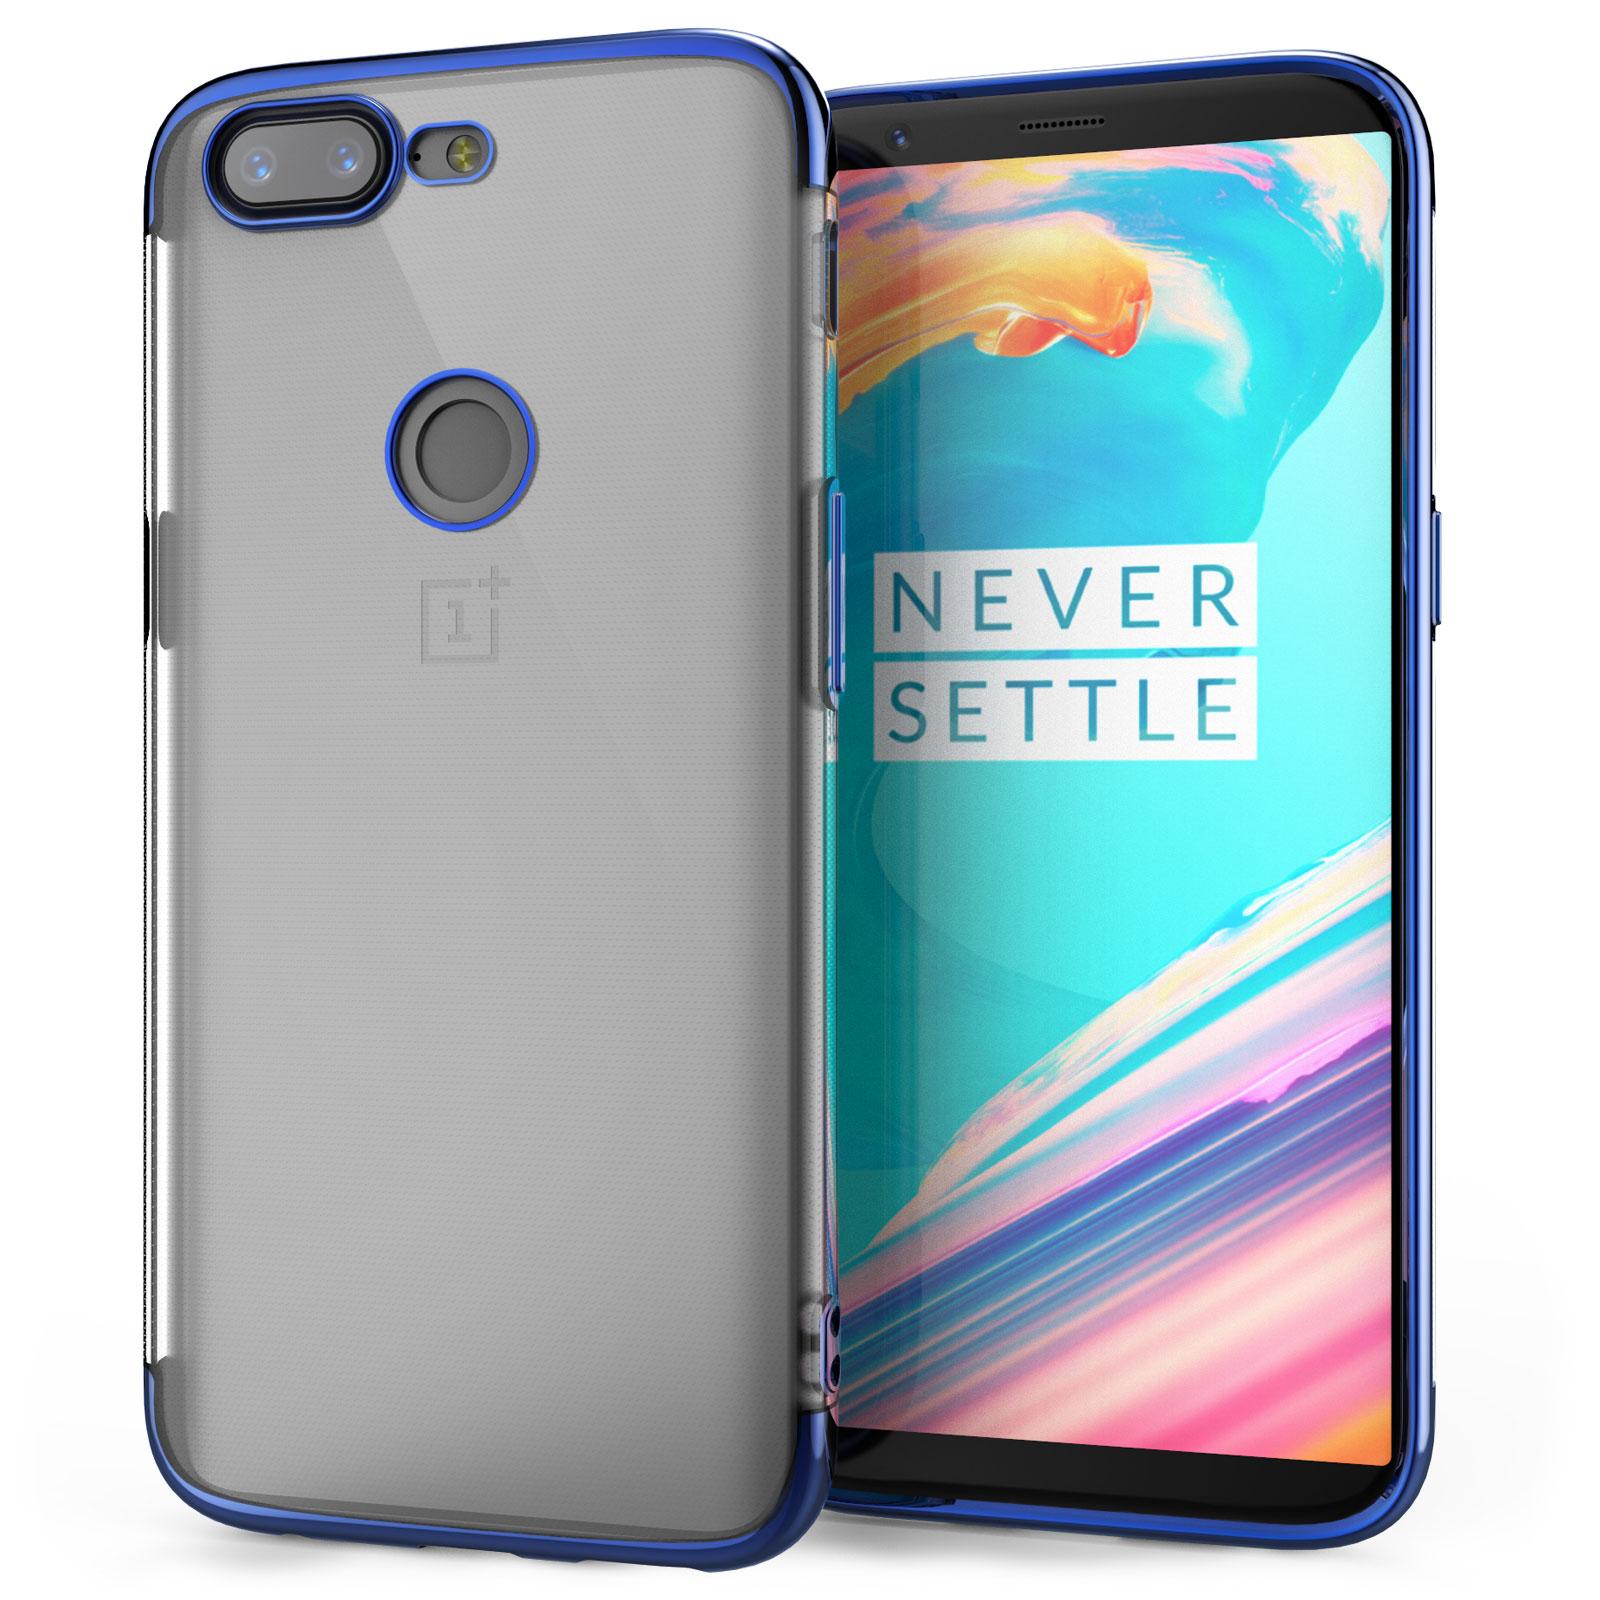 Caseflex Θήκη Σιλικόνης OnePlus 5T - Clear / Blue & Screen Protector (ONE-PLUS-Z409)